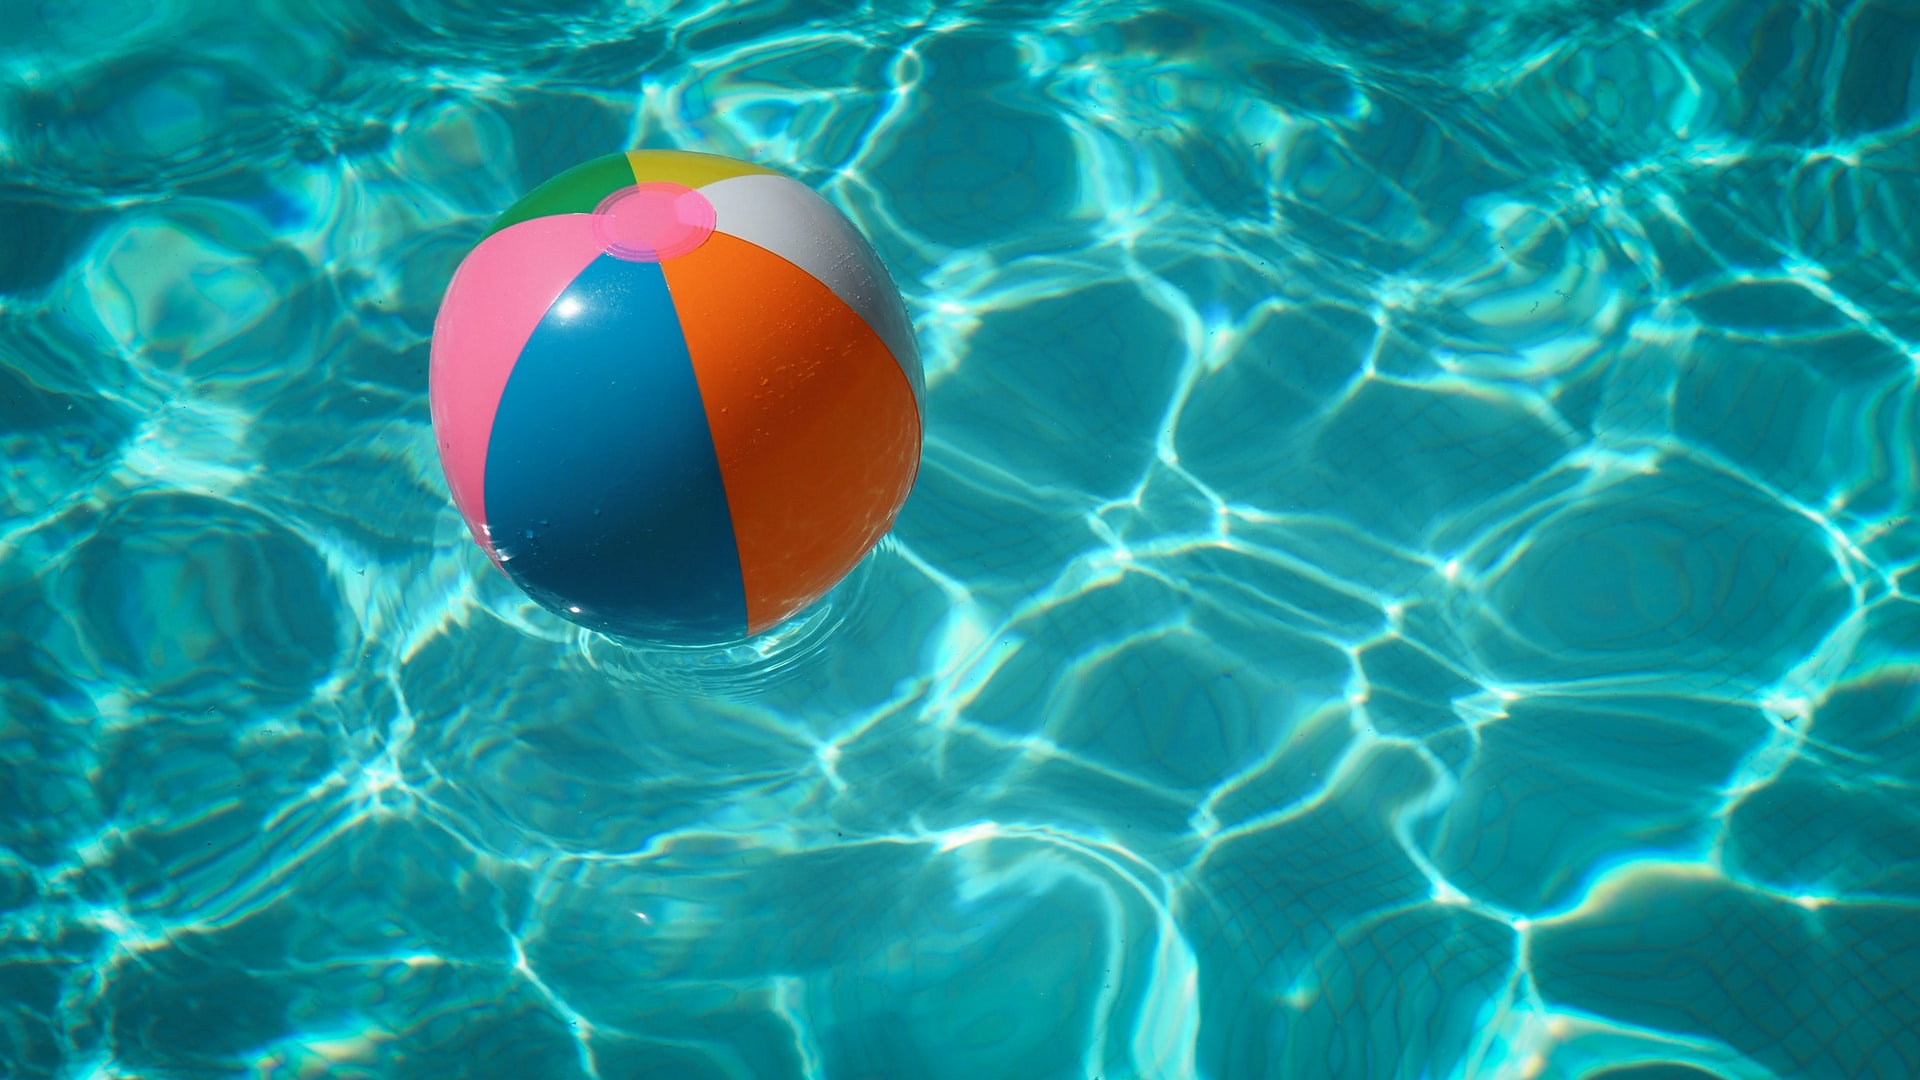 raphael-biscaldi-unsplash_ swimming pool spa